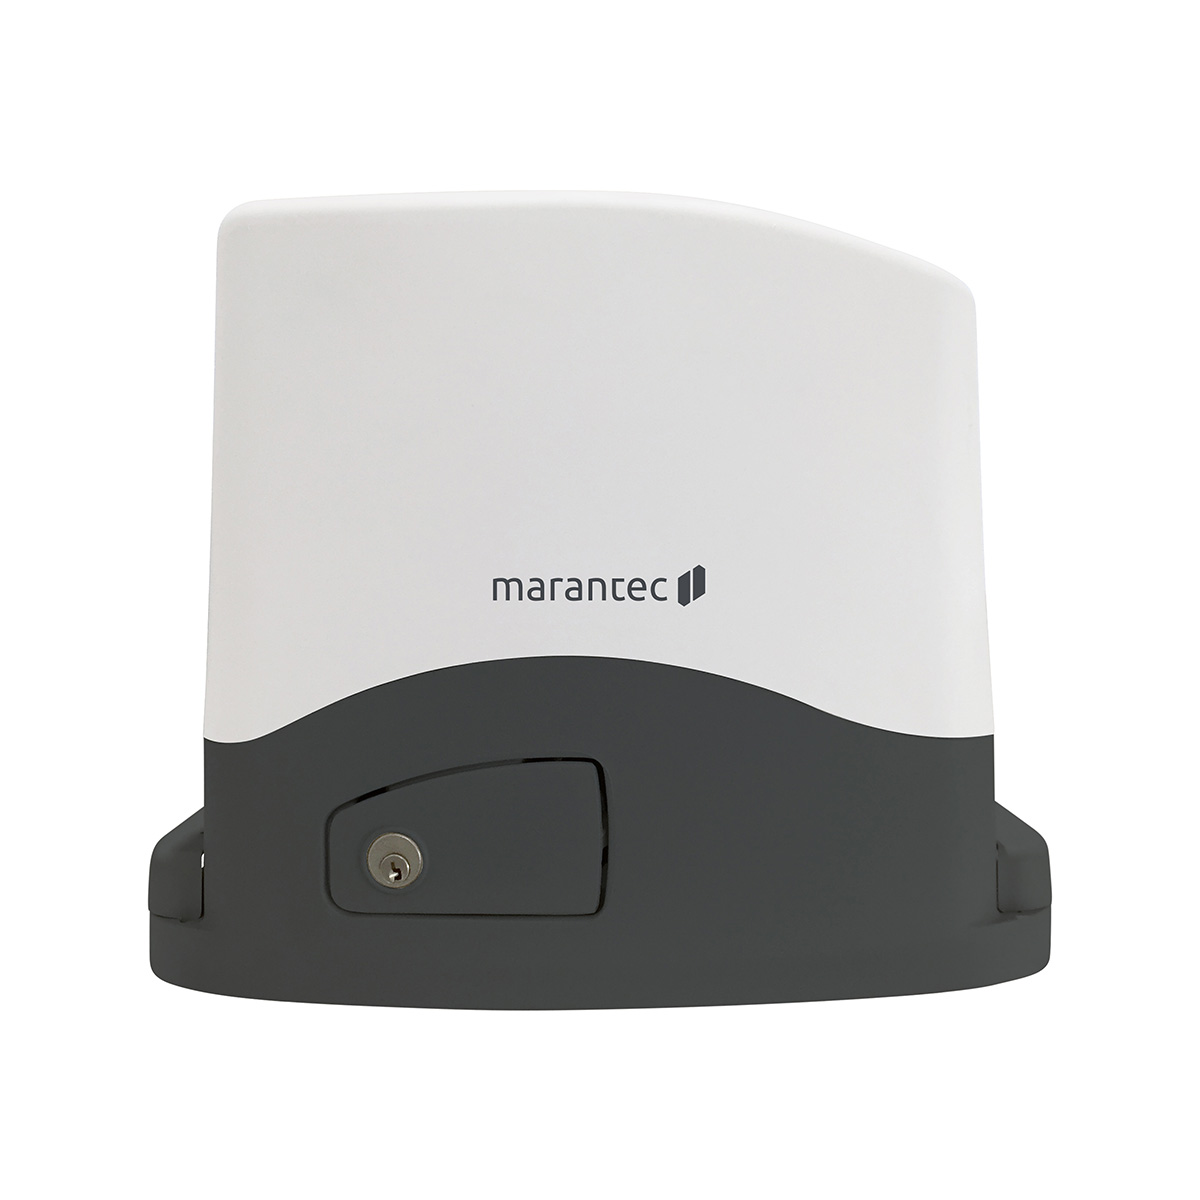 Marantec Comfort TU500 KIT Schiebetorantrieb